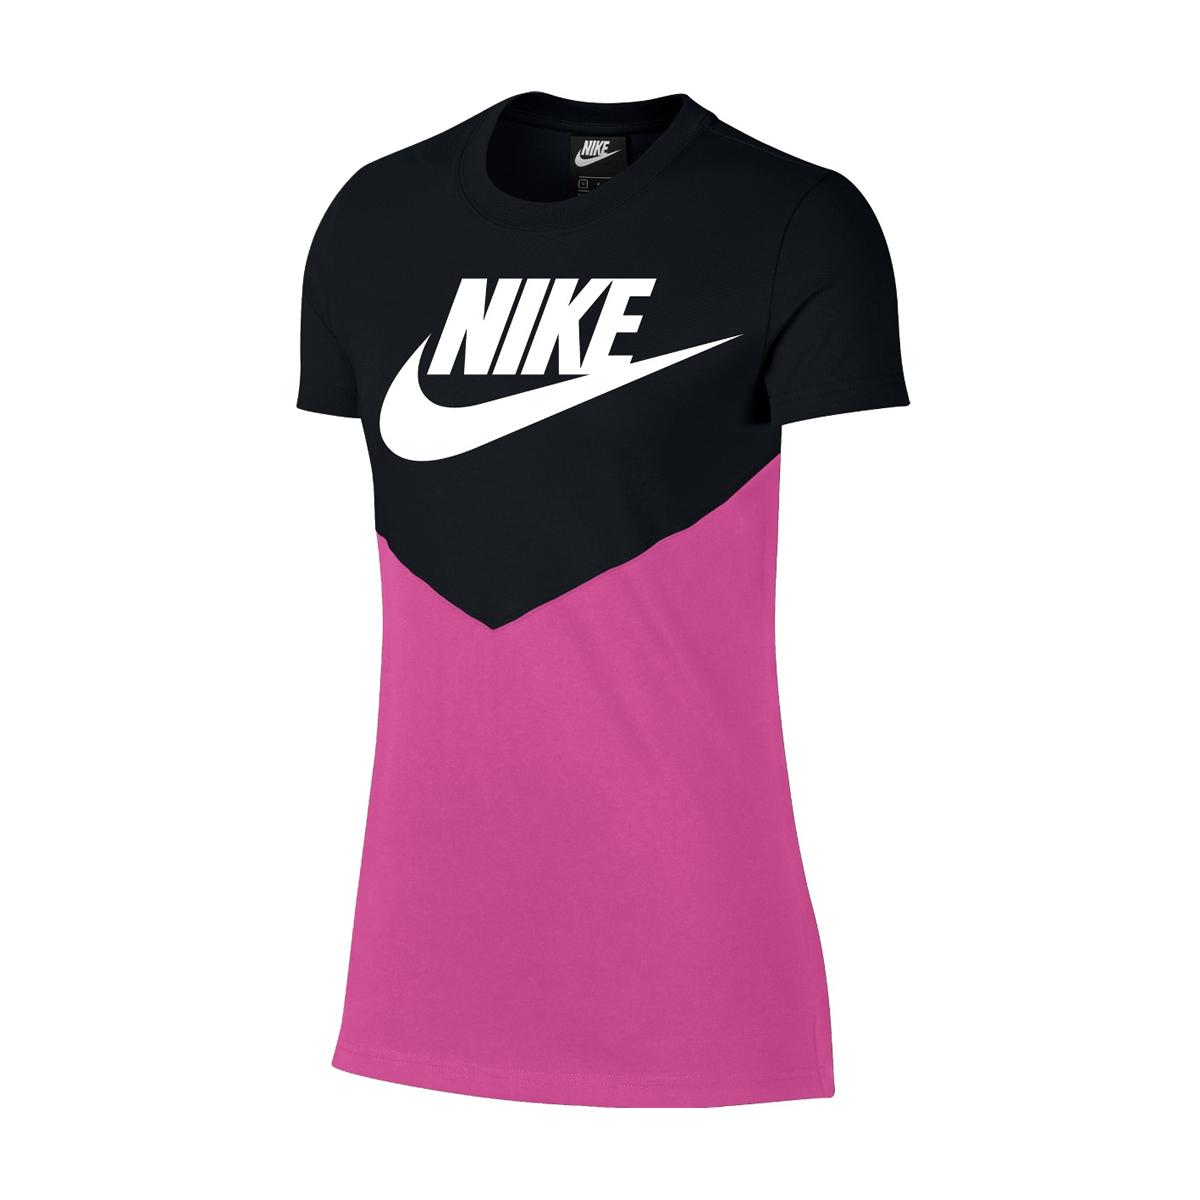 ef467024 Nike Womens Heritage Vintage Short Sleeve T Shirt Black Active Fuchsia